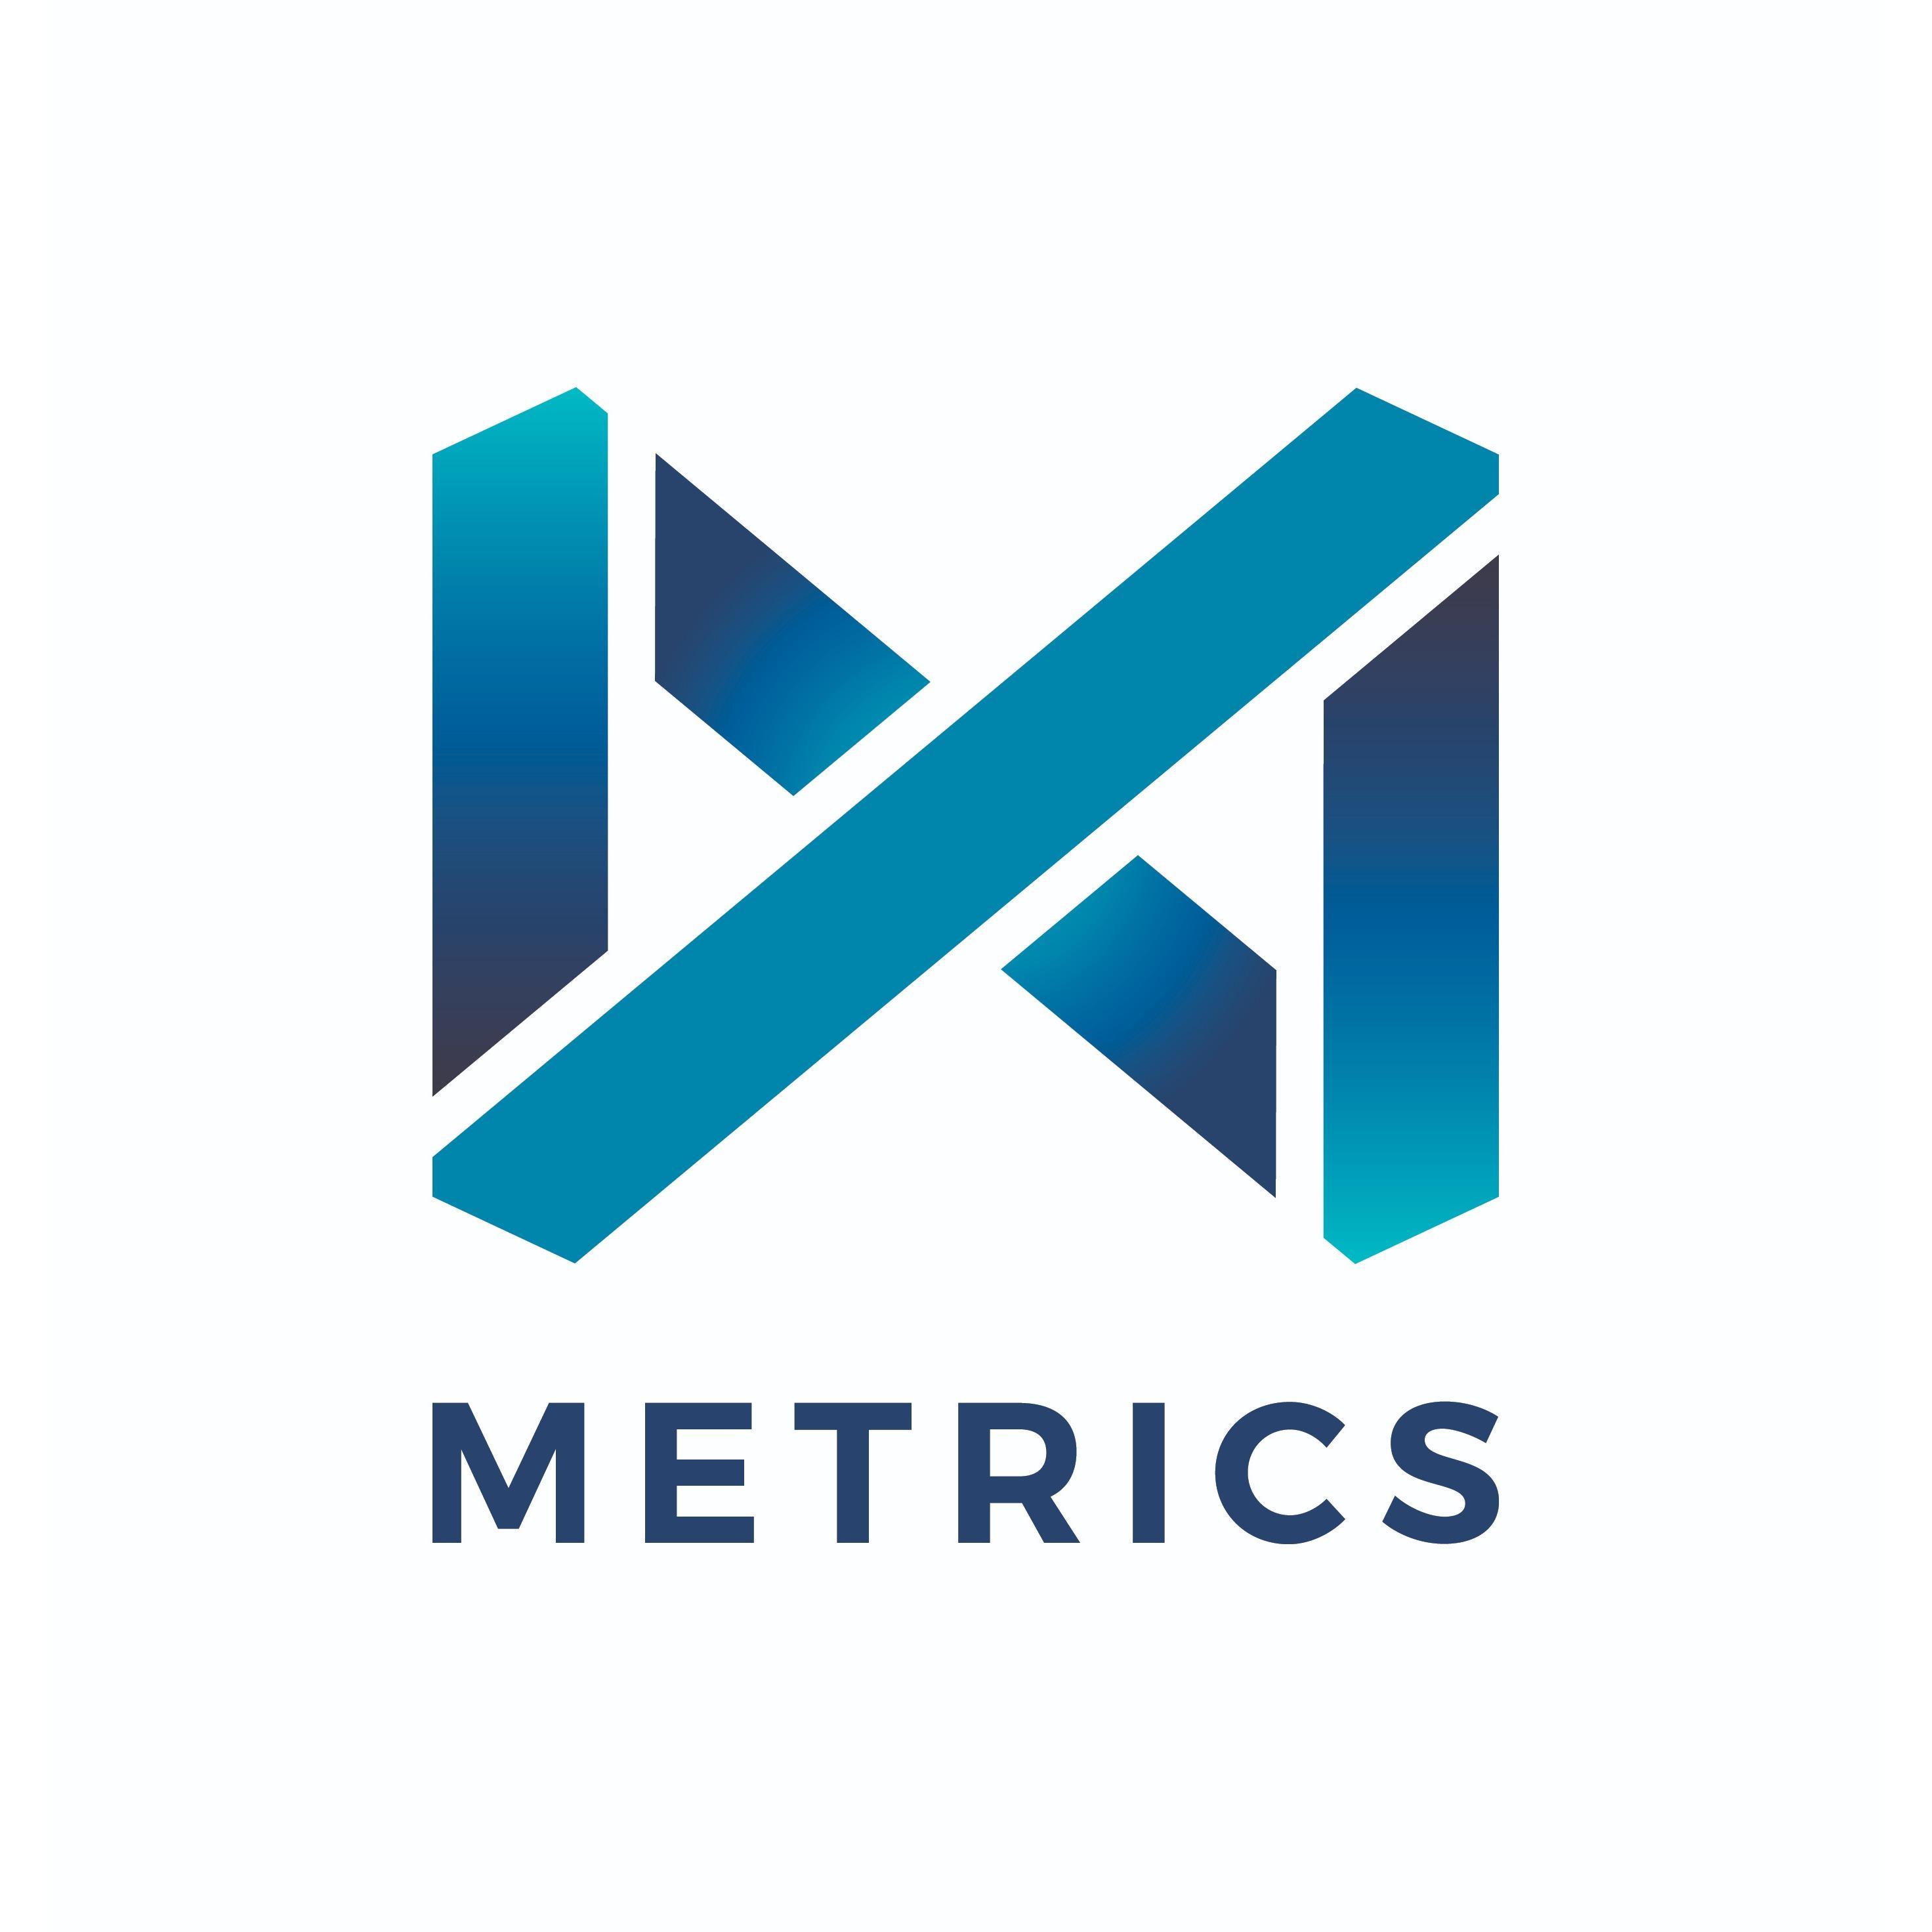 Metrics Credit Partners - North Sydney, NSW 2060 - 1300 010 311 | ShowMeLocal.com